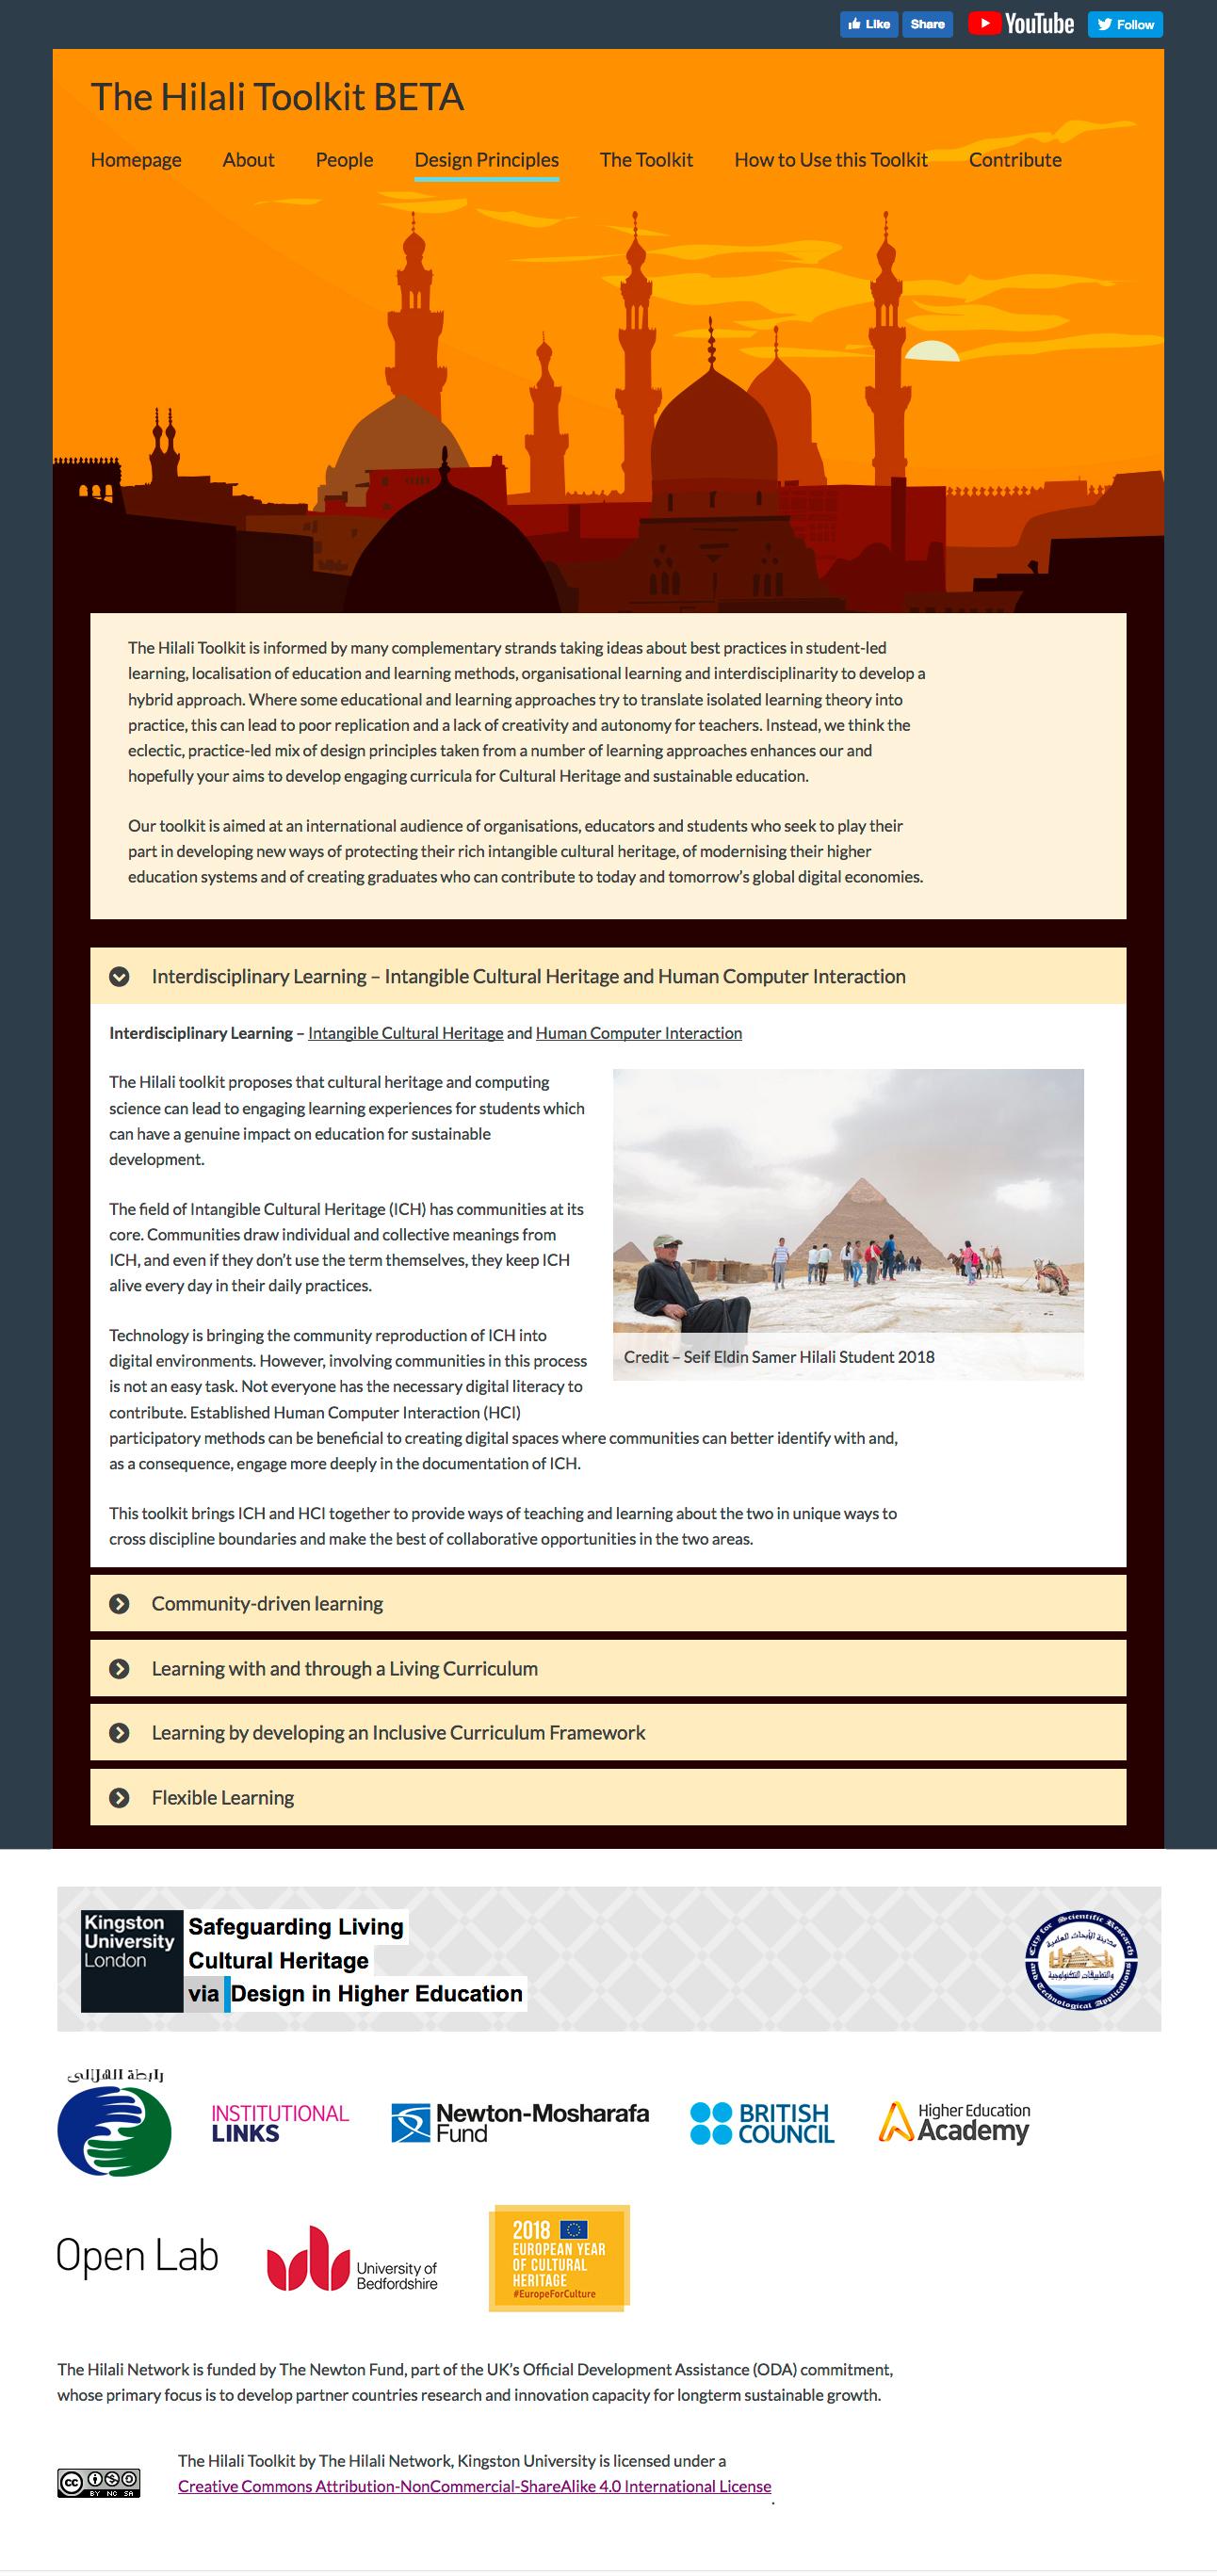 Screenshot of Hilali toolkit design principles page, including illustration of Egyptian skyline